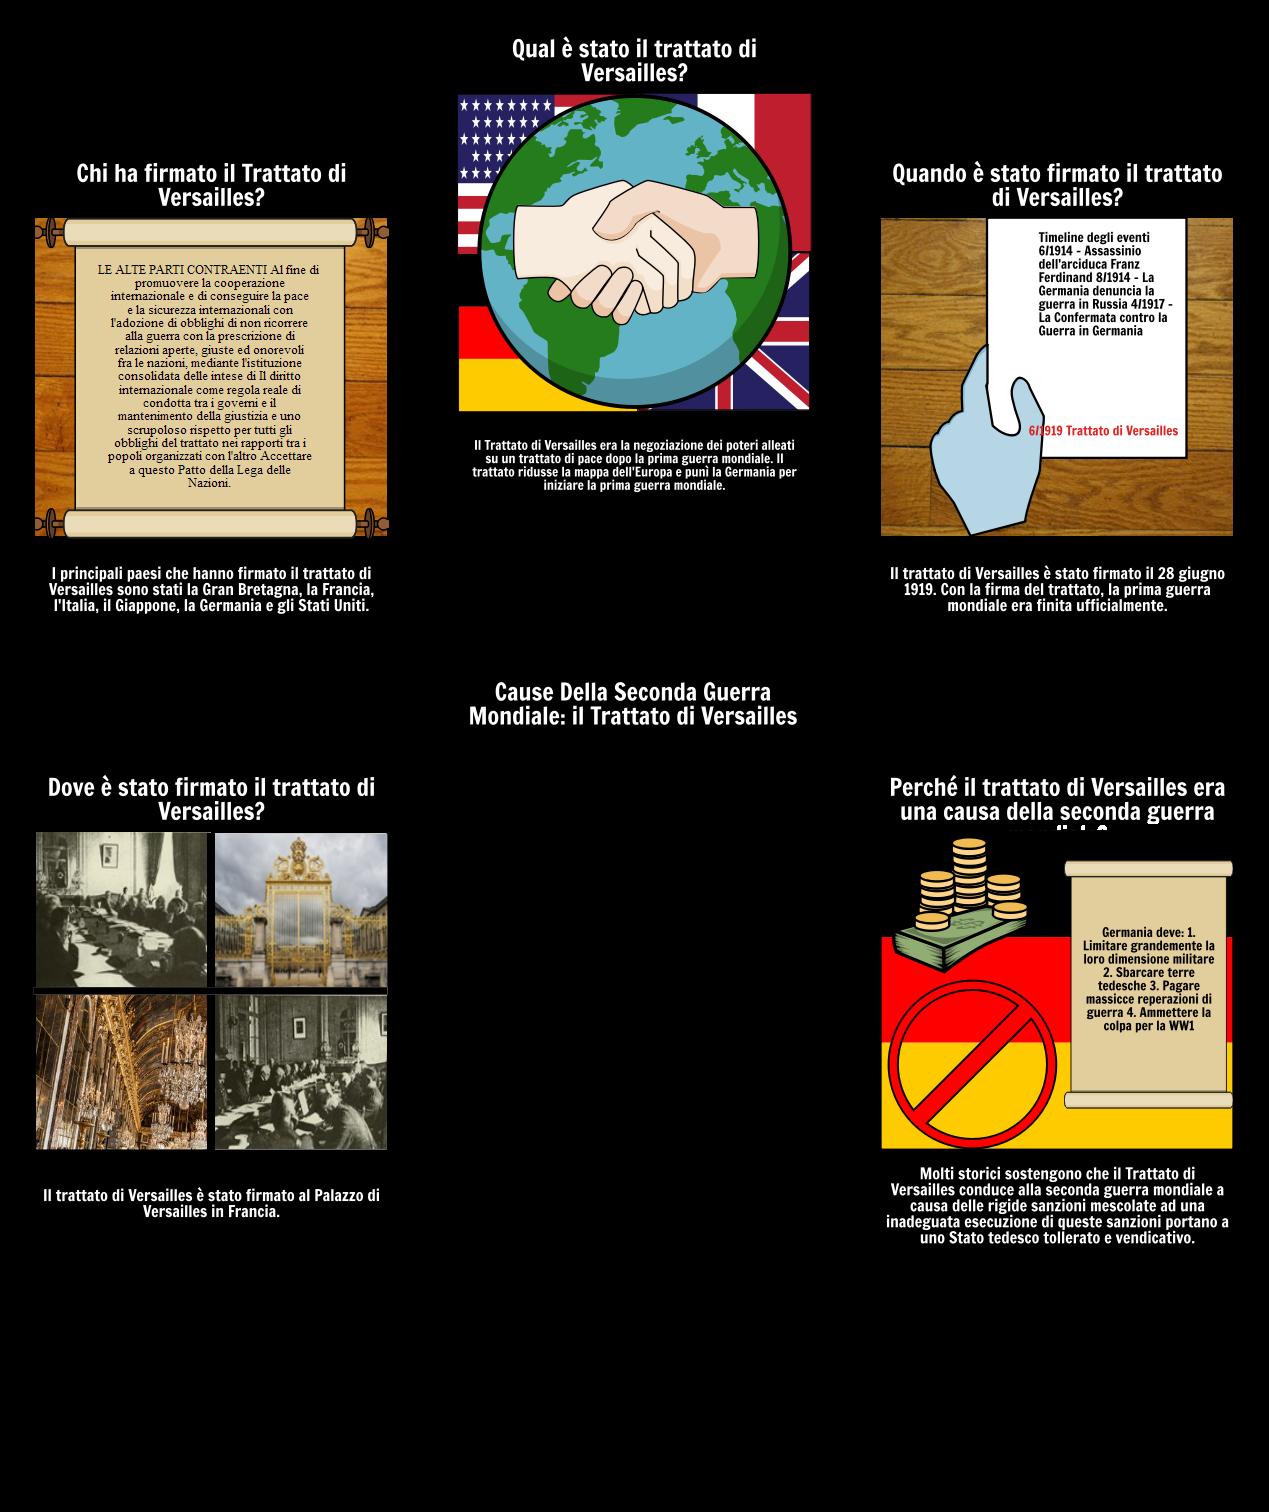 Cartina Storica Prima Guerra Mondiale.Cause Della Seconda Guerra Mondiale Storyboard